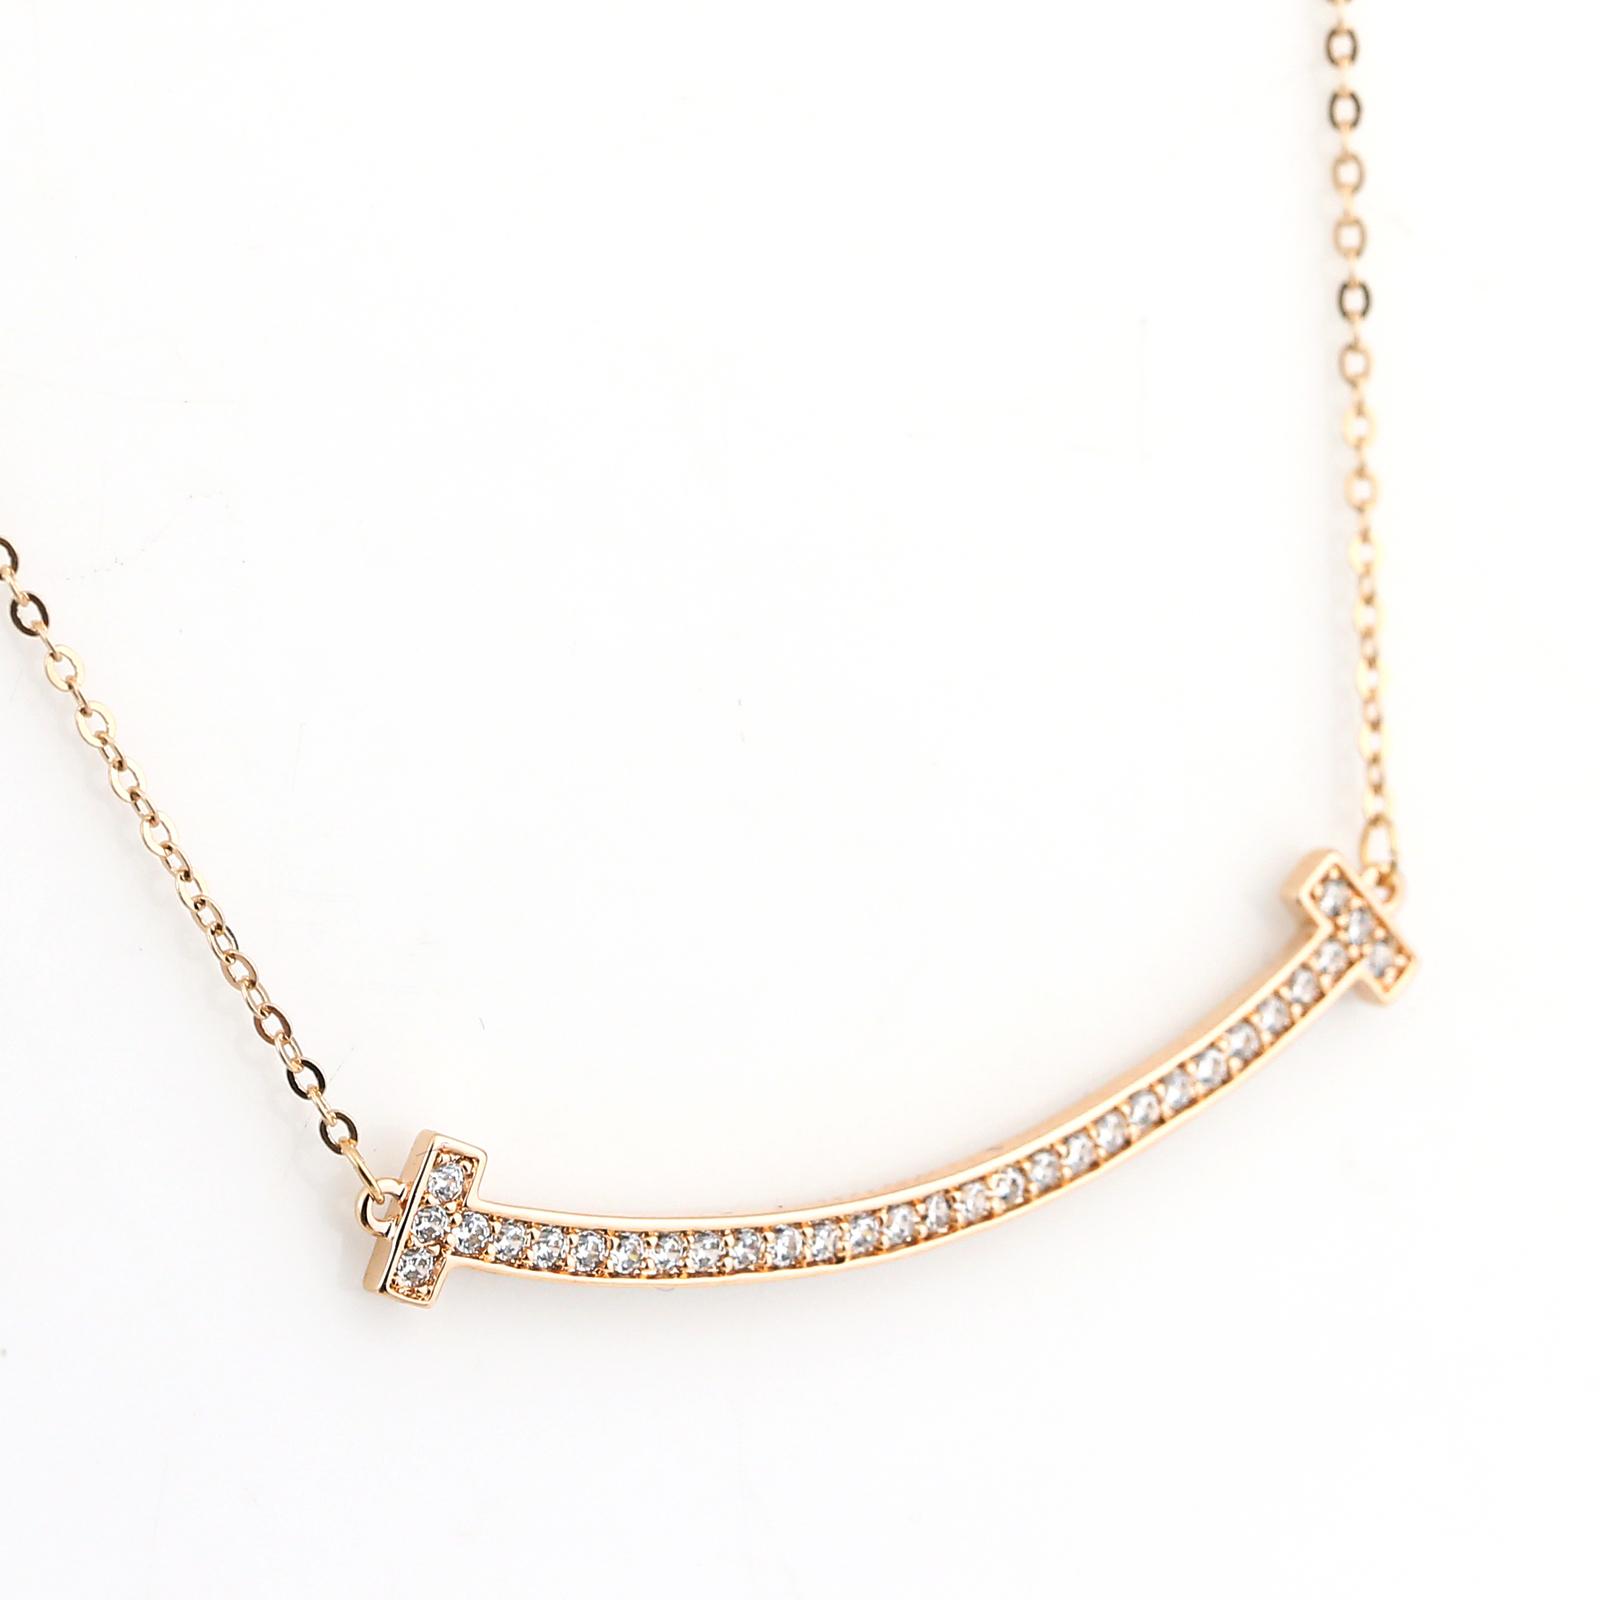 UE- Sleek Rose Tone Designer Bar Necklace With Pave Set Swarovski Style Crystals image 4